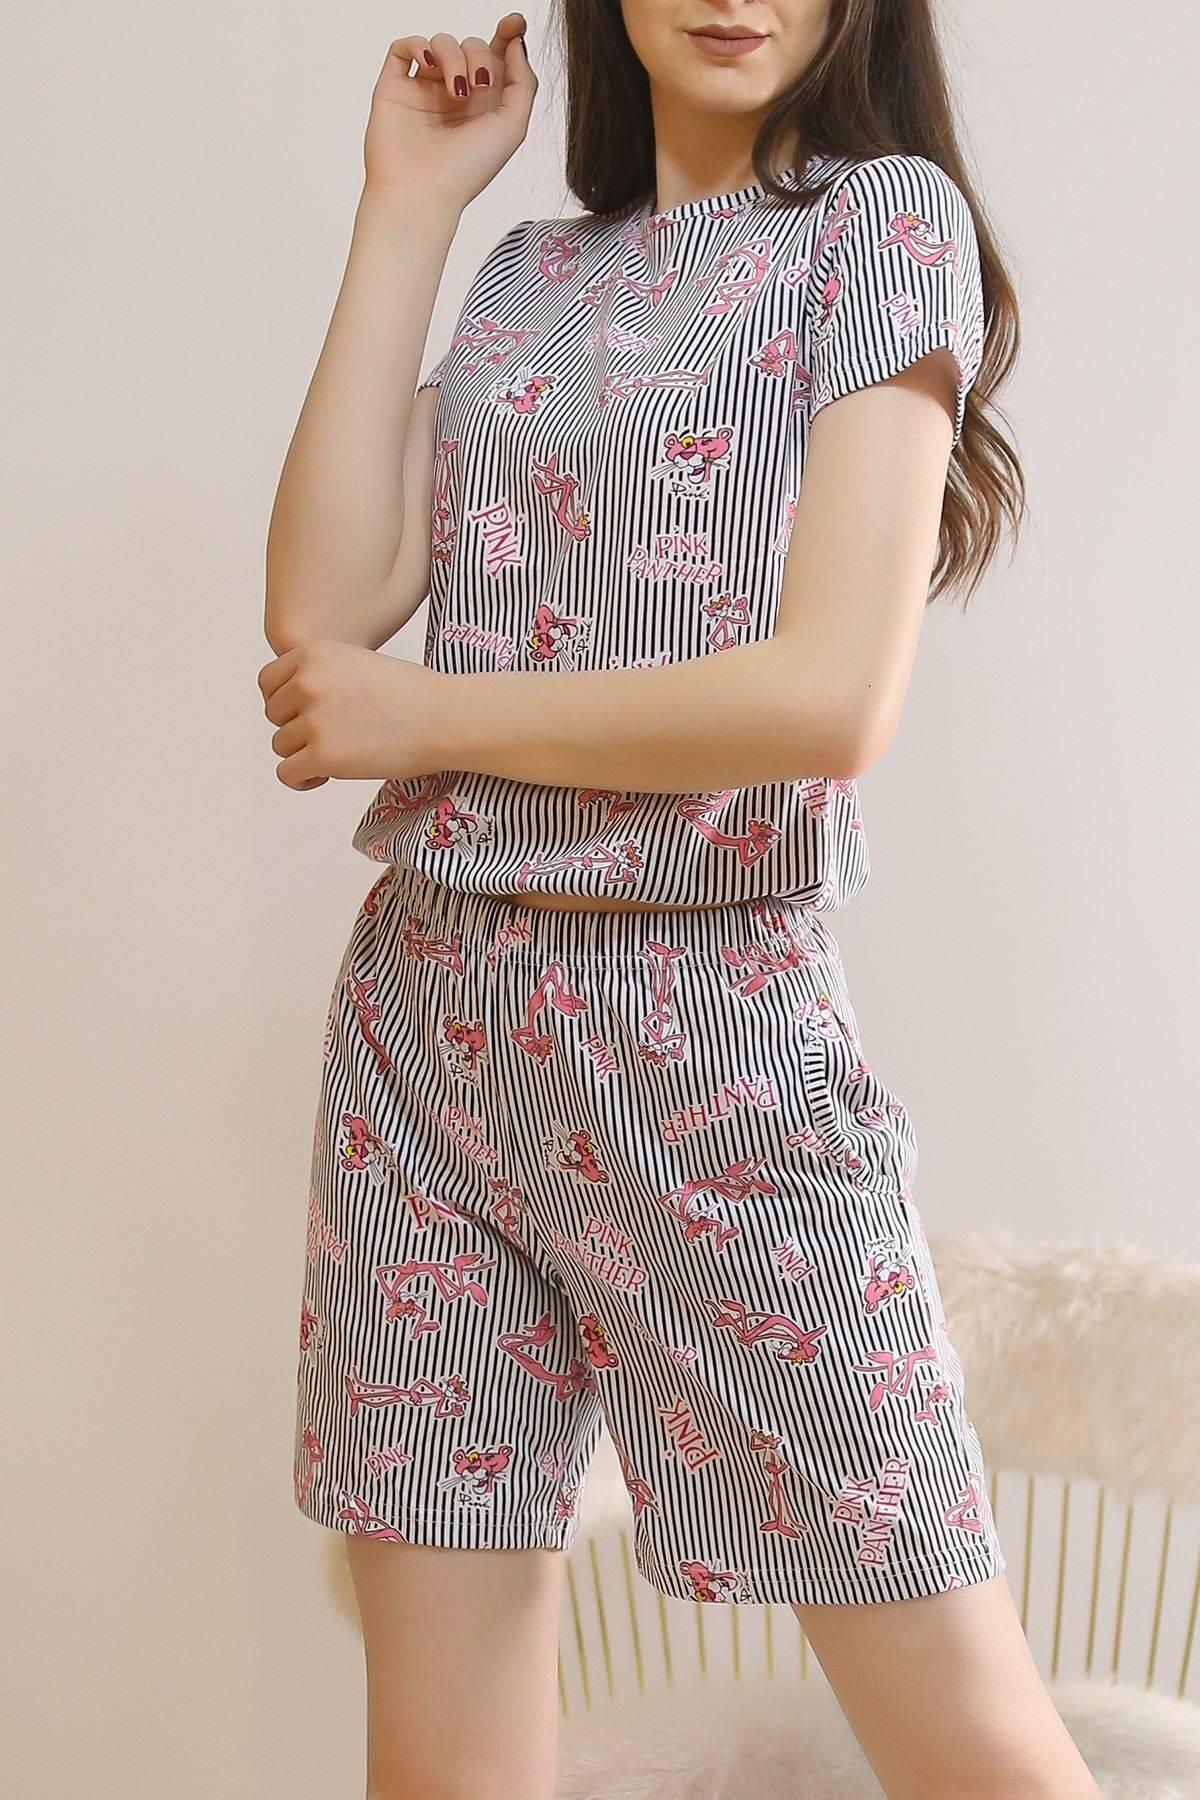 Şortlu Pijama Takımı Siyah1 - 5924.1059.